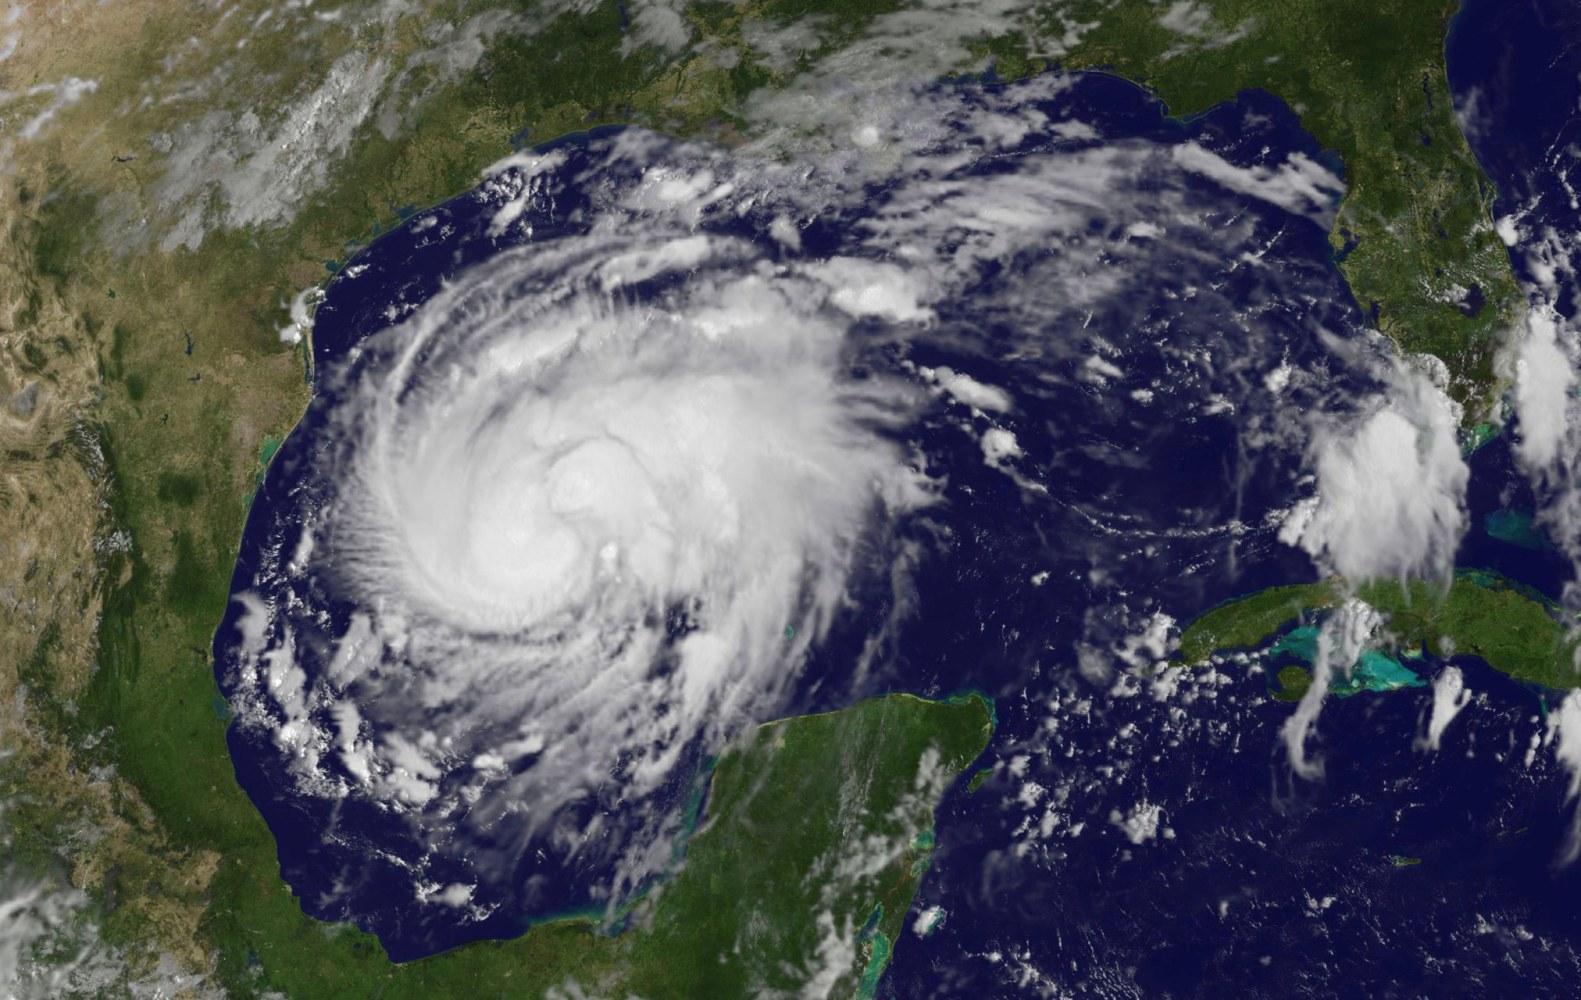 Hurricane Harvey Intensifies to Category 2 as It Roars Toward Texas - NBC News